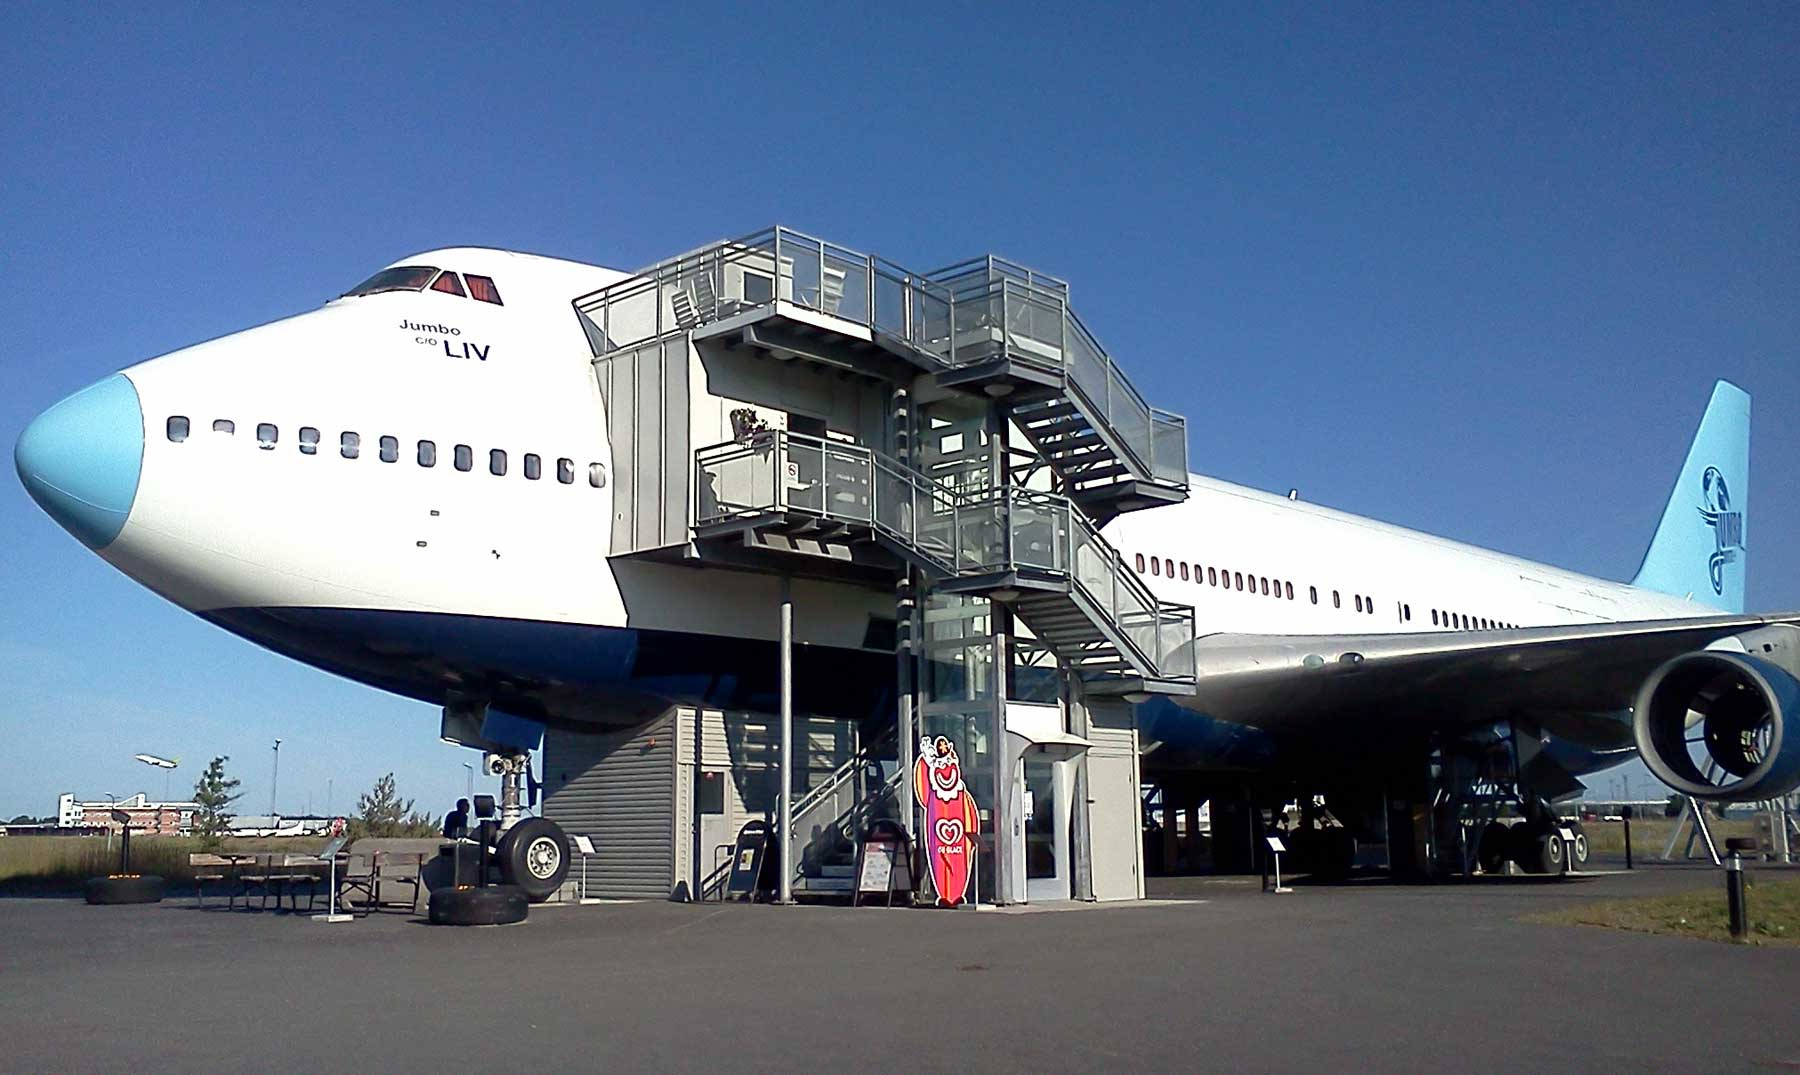 Hotel avion Jumbo Stay